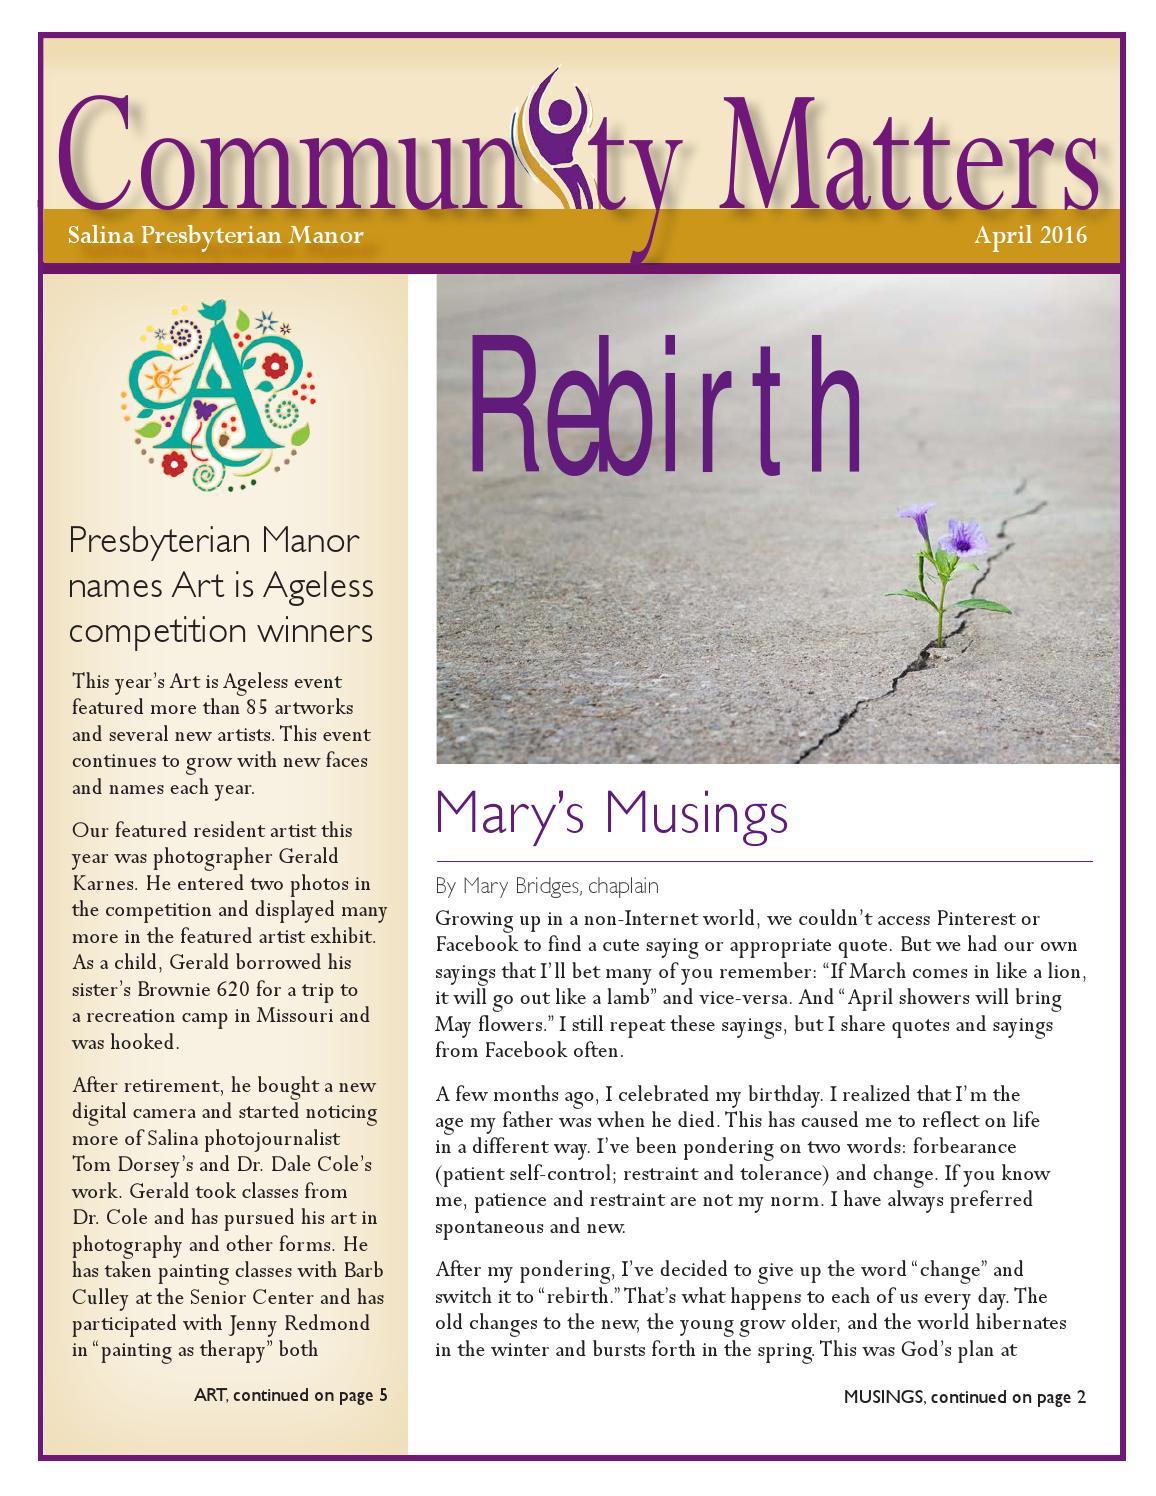 Salina Community Matters April 2016 by Presbyterian Manors